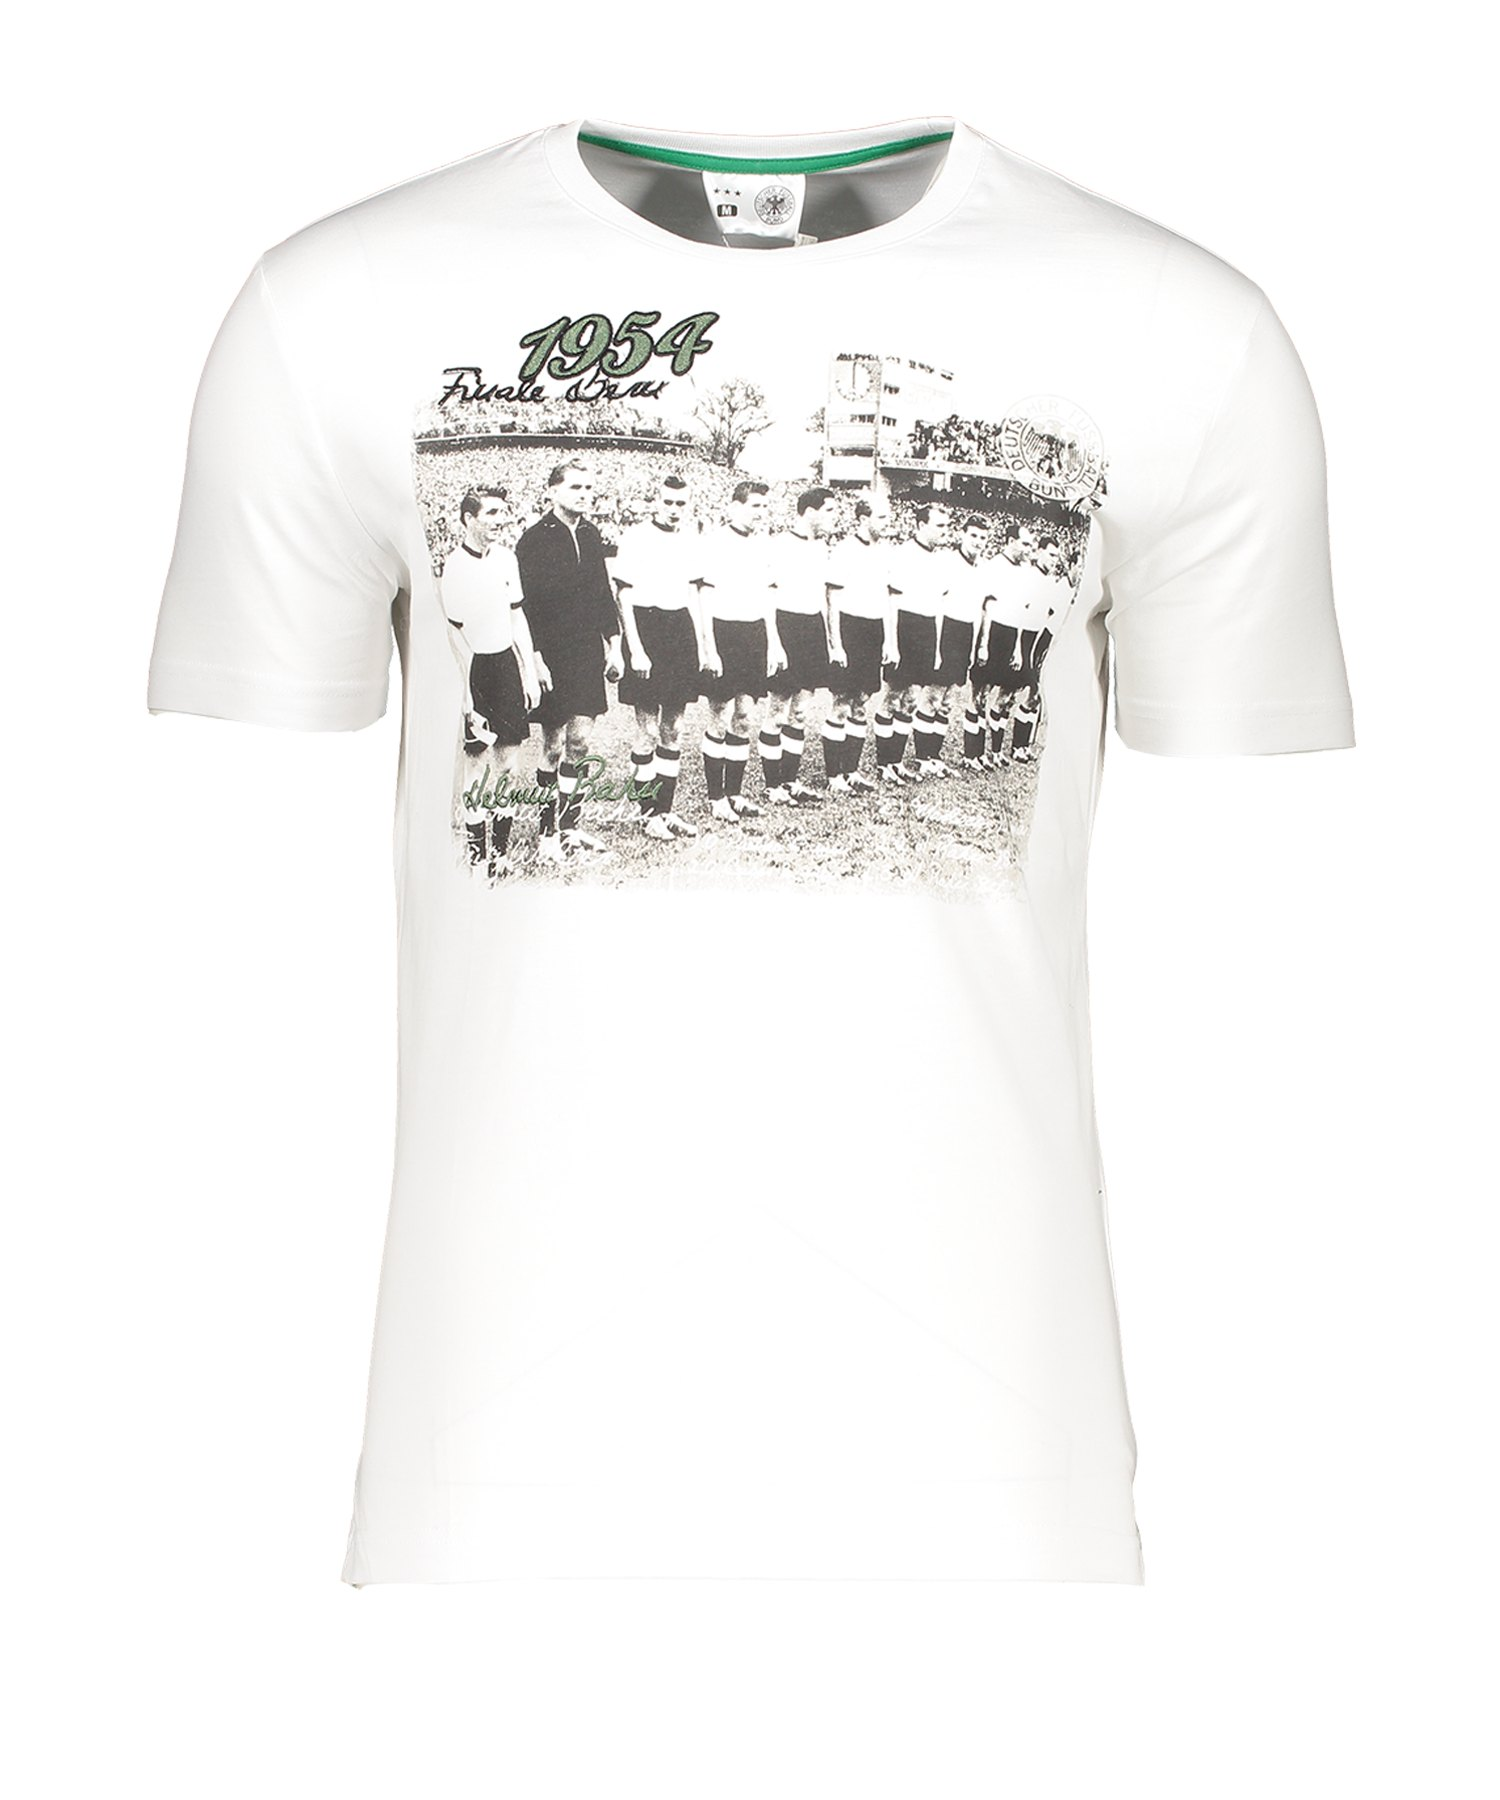 DFB Deutschland T-Shirt 1954 S - Weiss